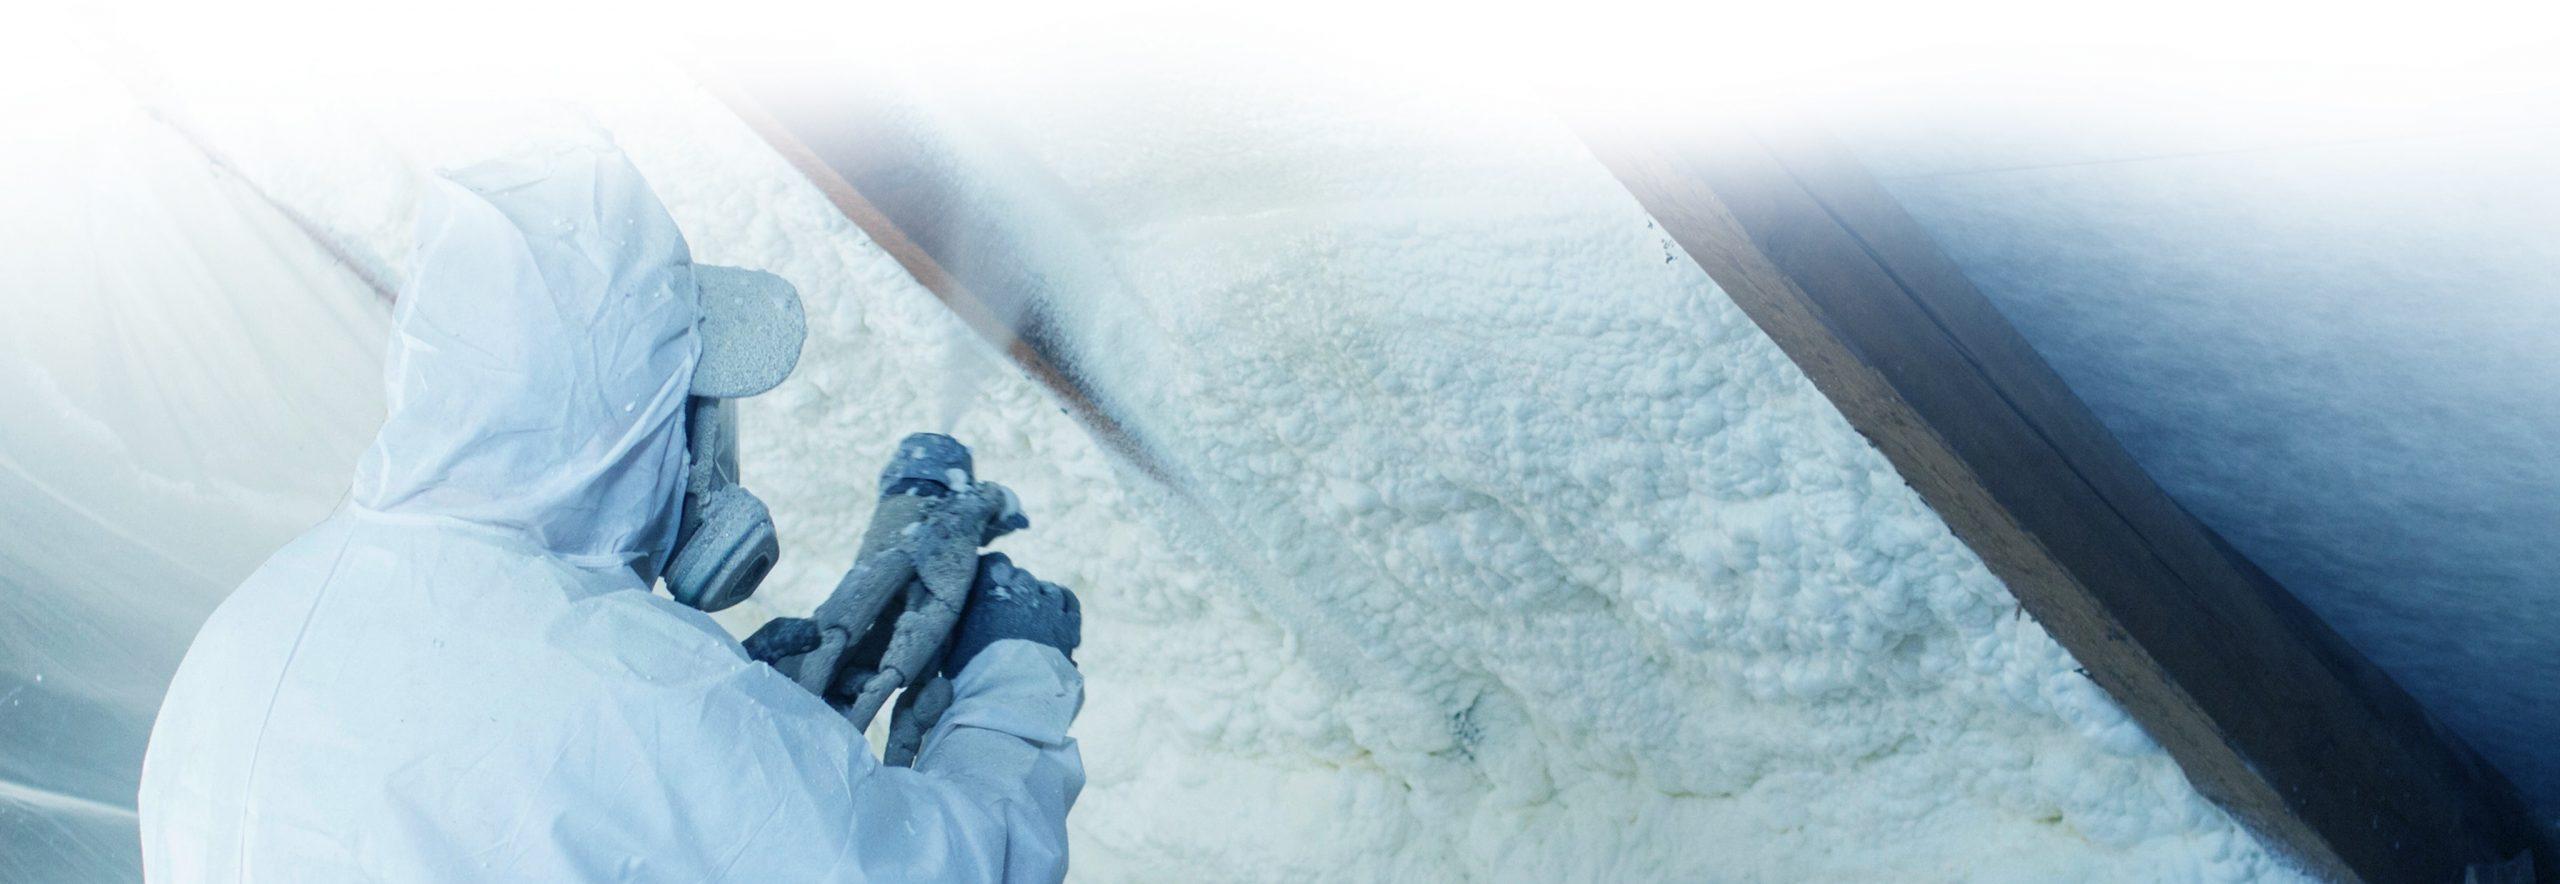 Contractor performing spray foam insulation services